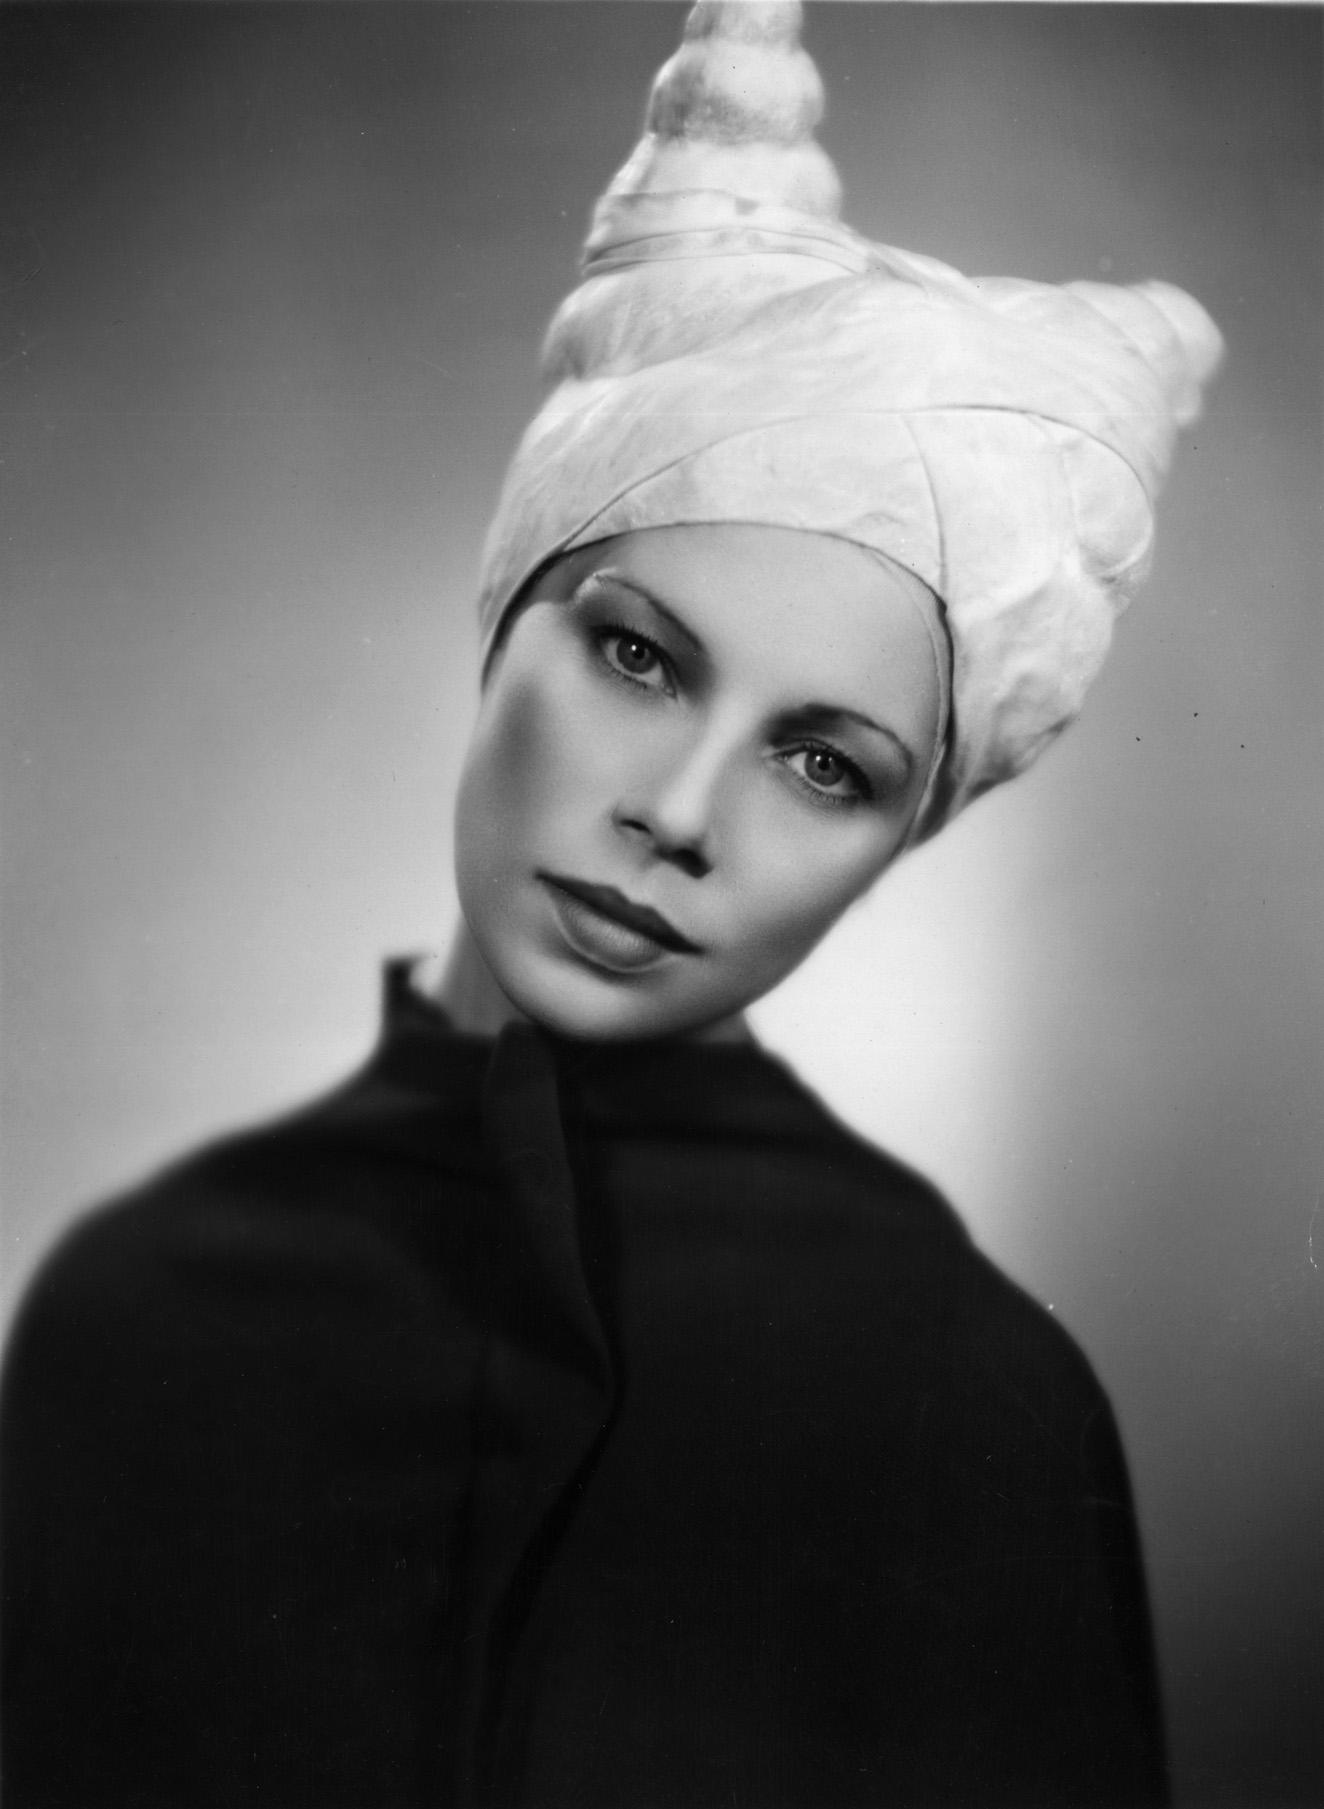 Tilly Losch fine art photography